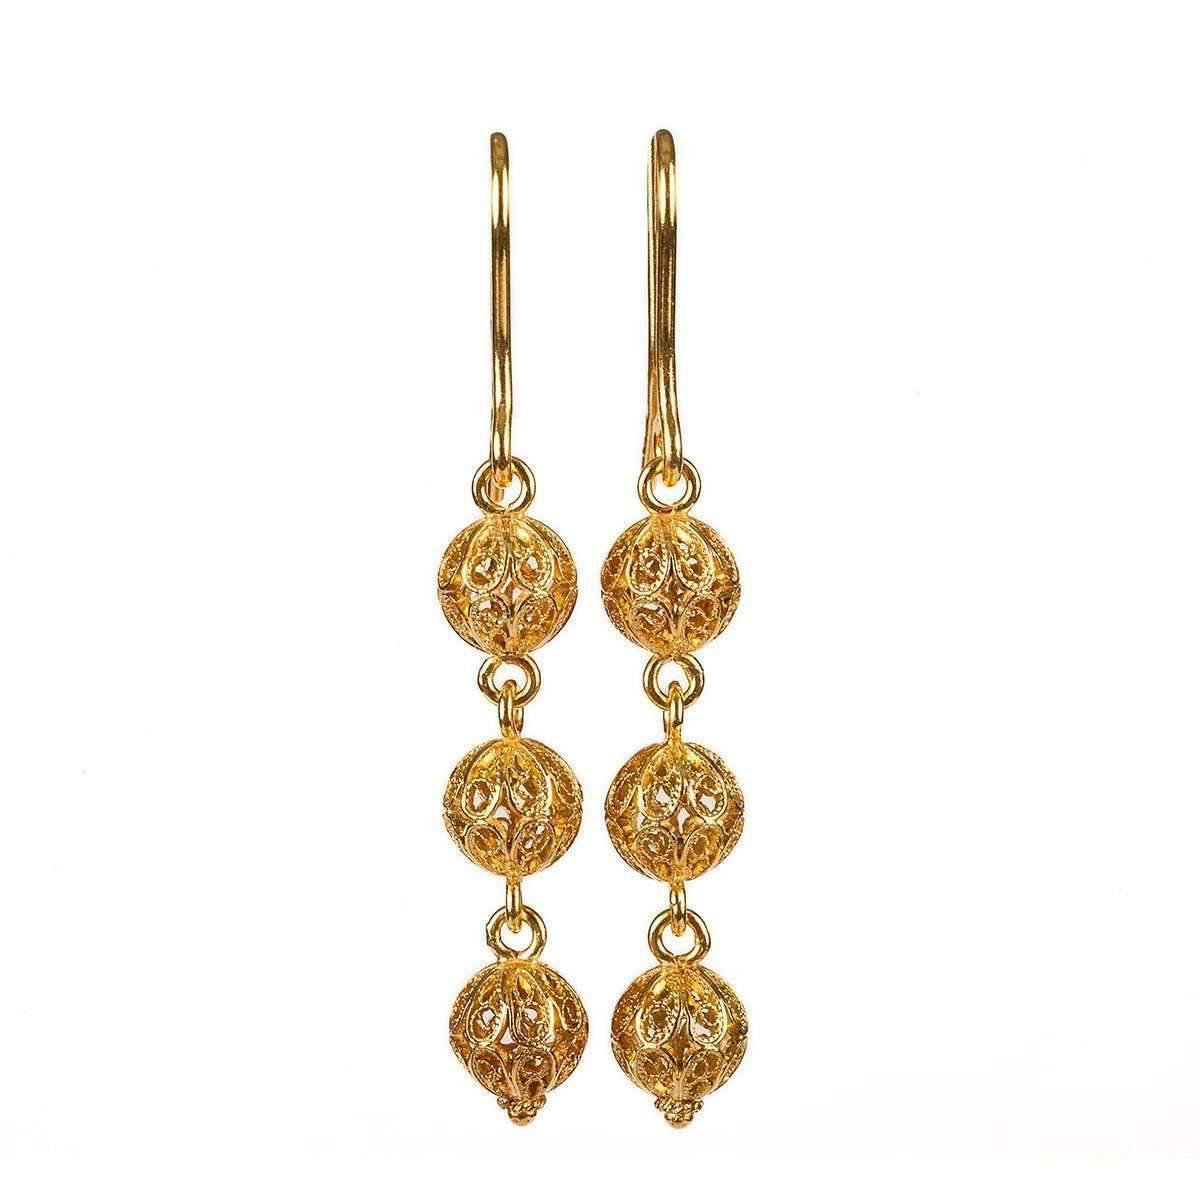 0f9464f040d 18 Kt Gold Earrings - Best All Earring Photos Kamilmaciol.Com